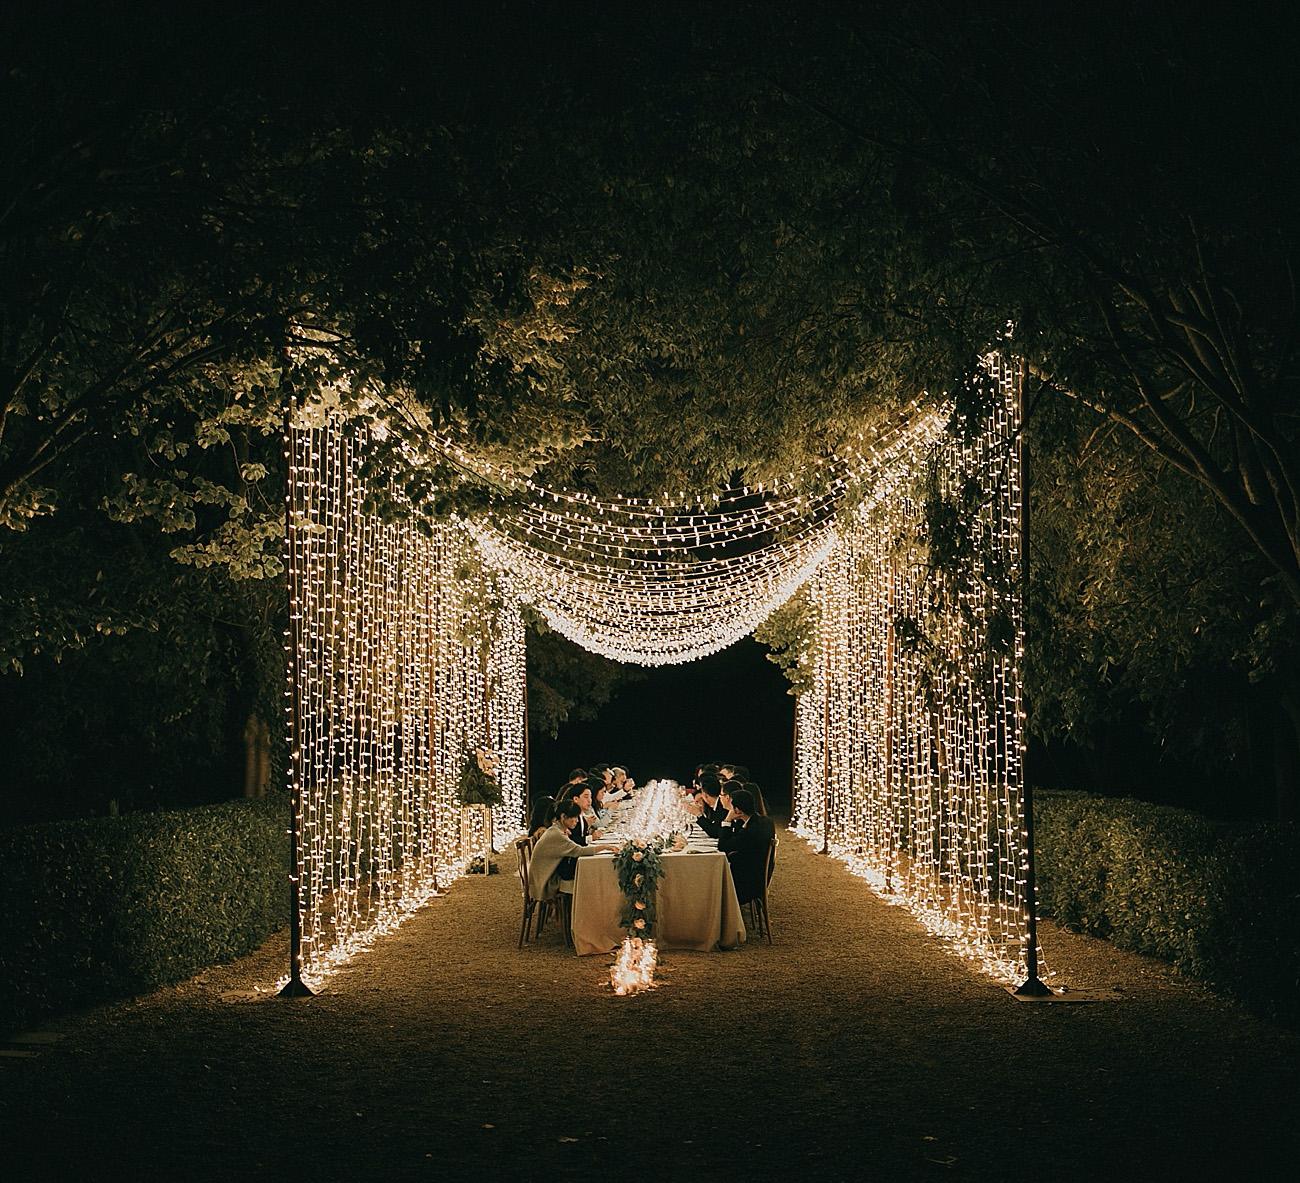 Dinner under a curtain of fairy lights